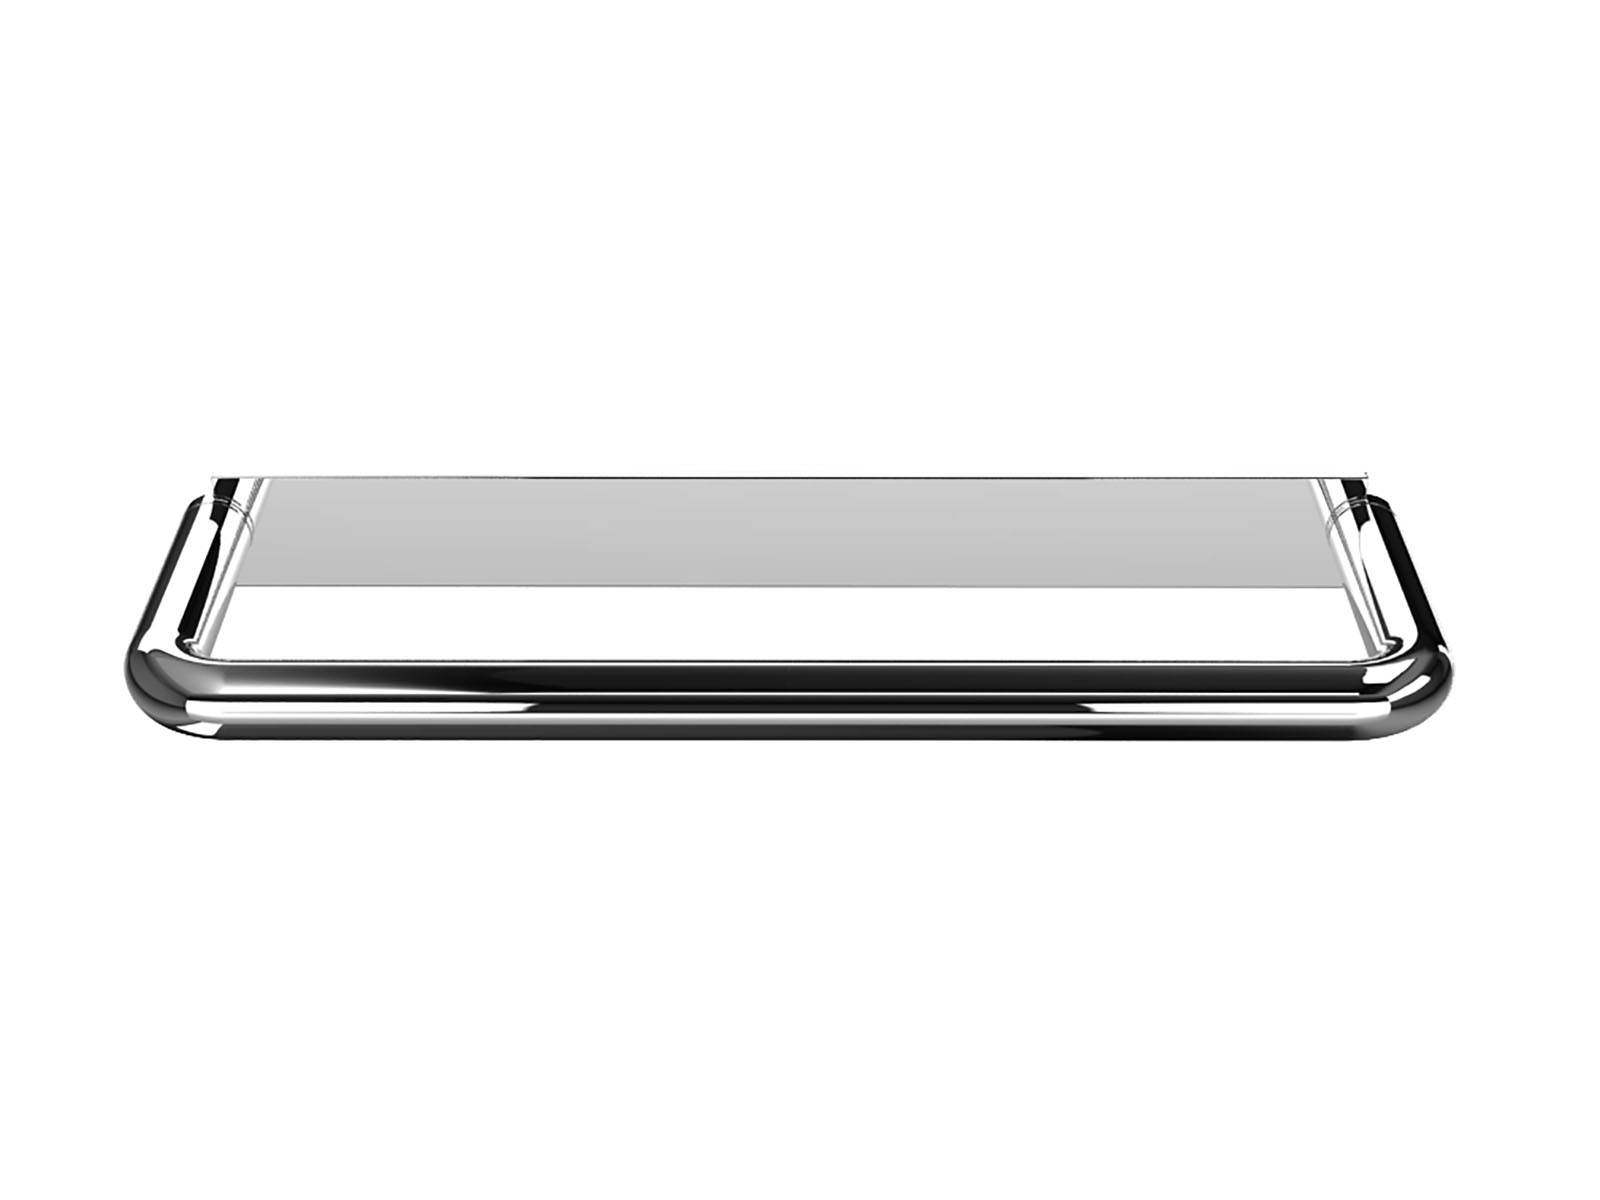 nina barre porte serviettes by mg12 design monica freitas. Black Bedroom Furniture Sets. Home Design Ideas